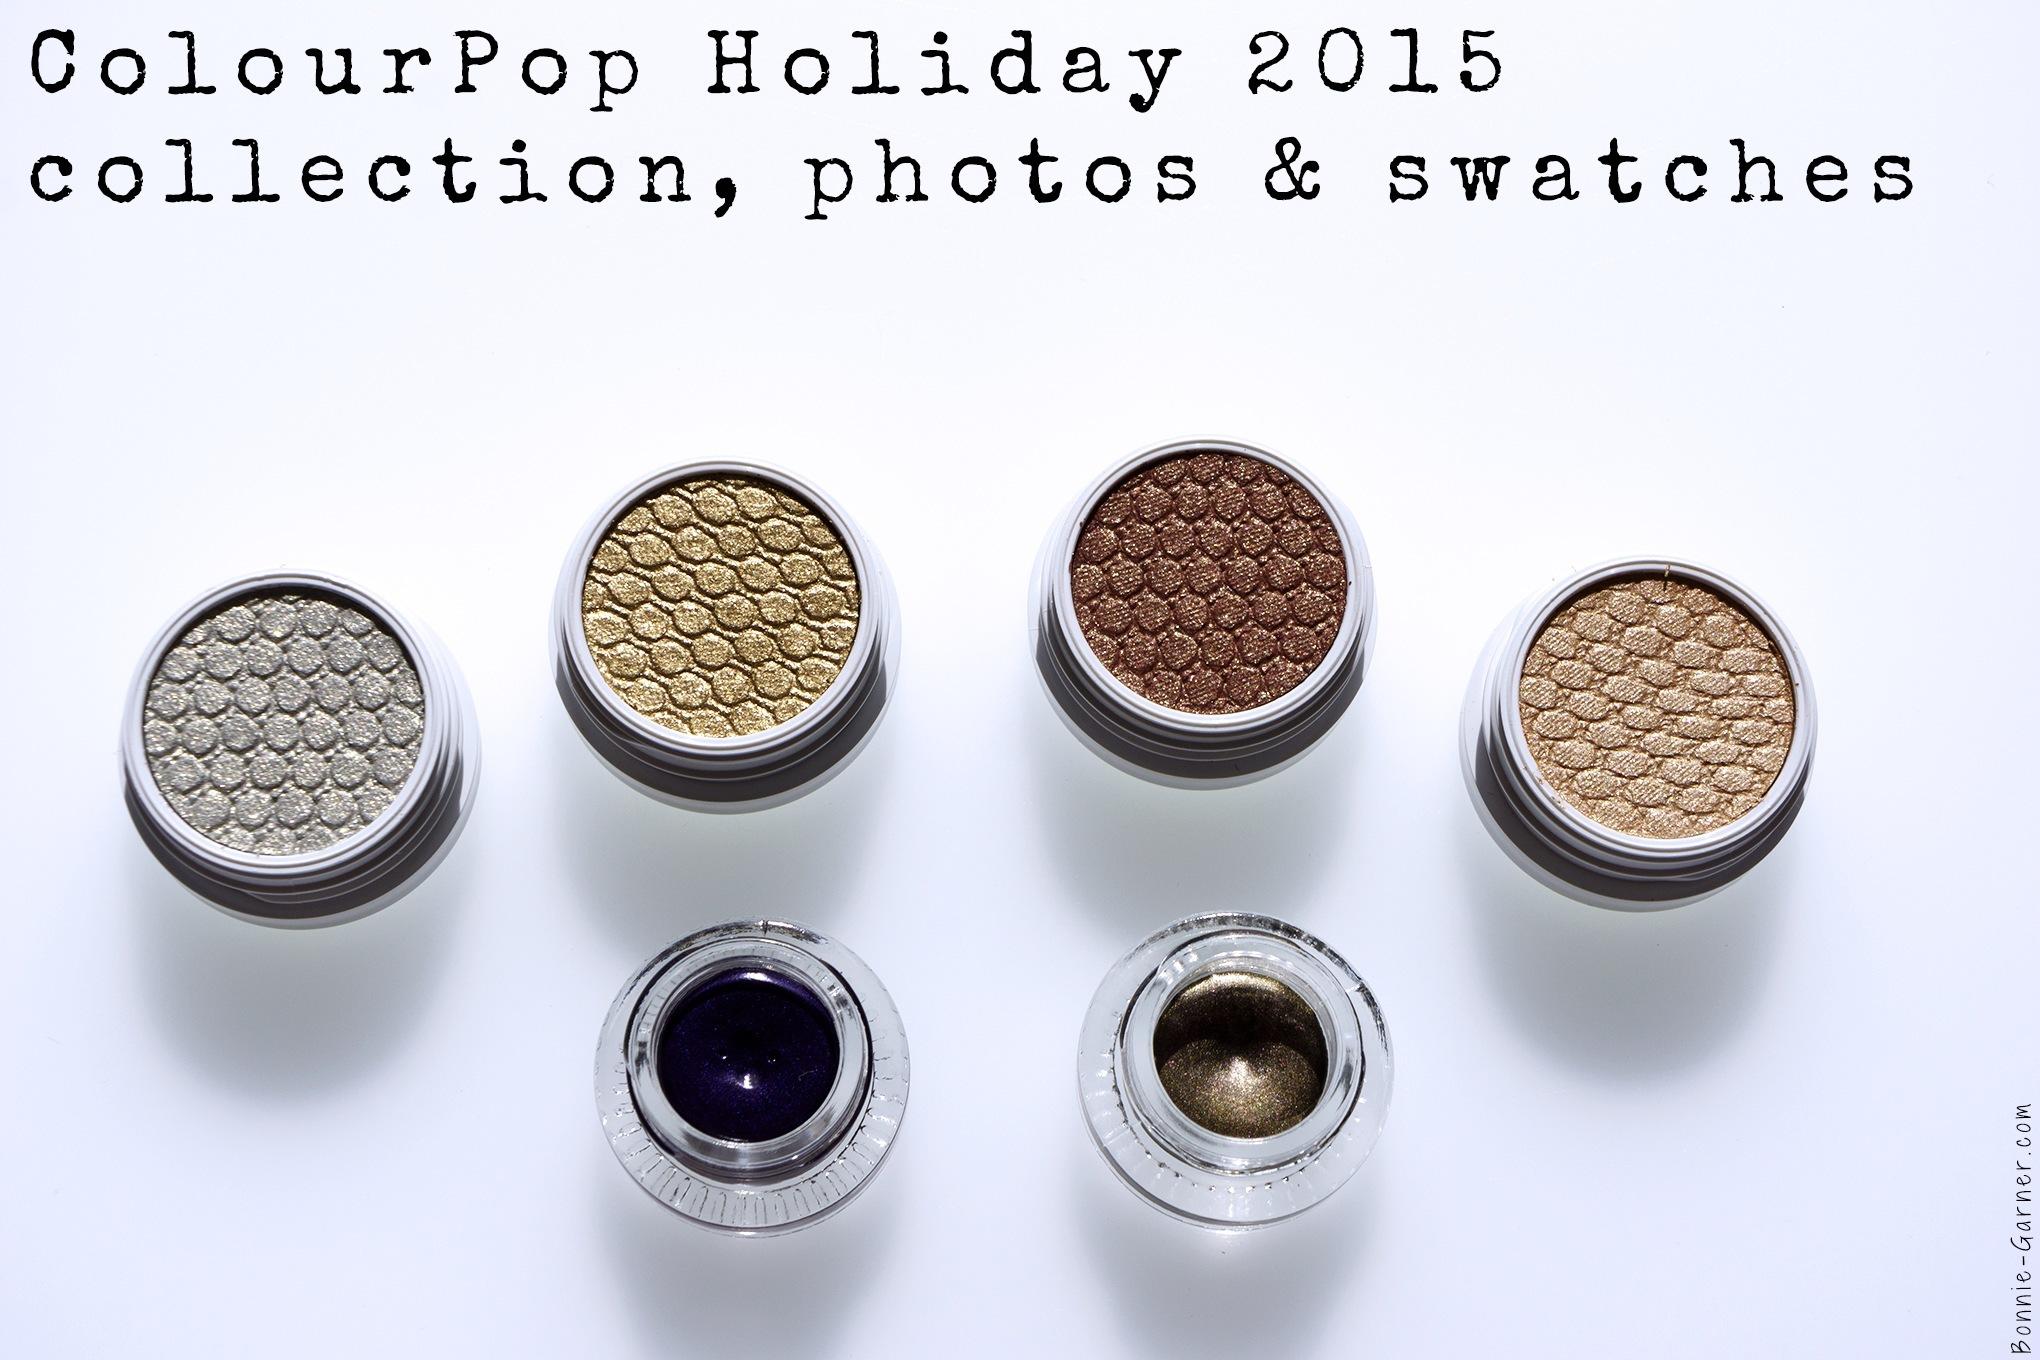 ColourPop Holiday 2015 collection, photos & swatches